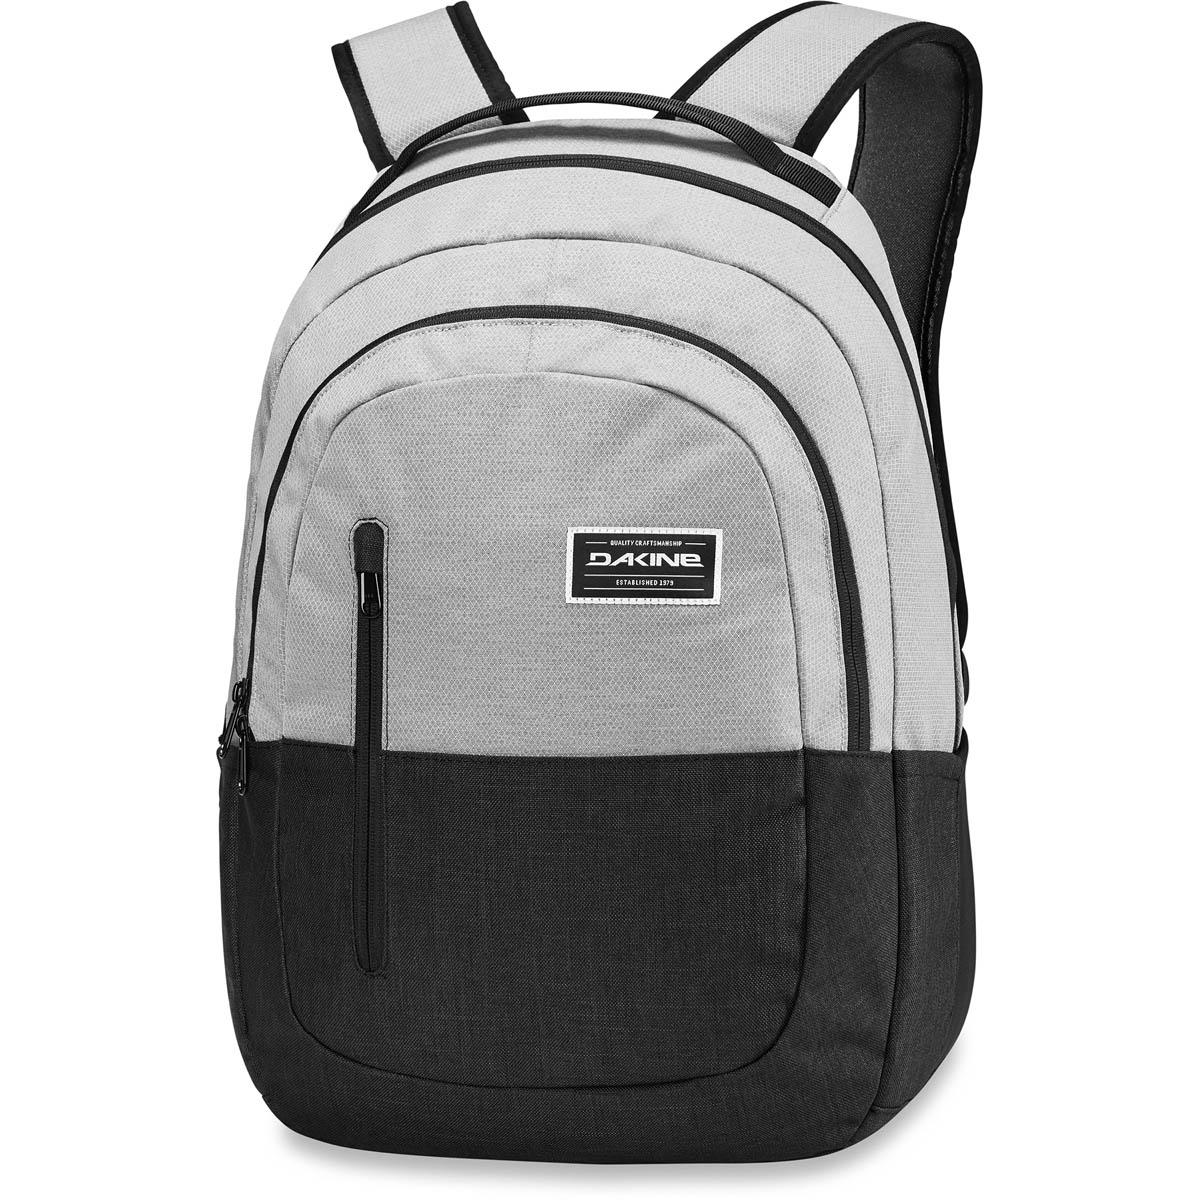 b916f8c8c8275 Dakine Foundation 26L Backpack Laurelwood